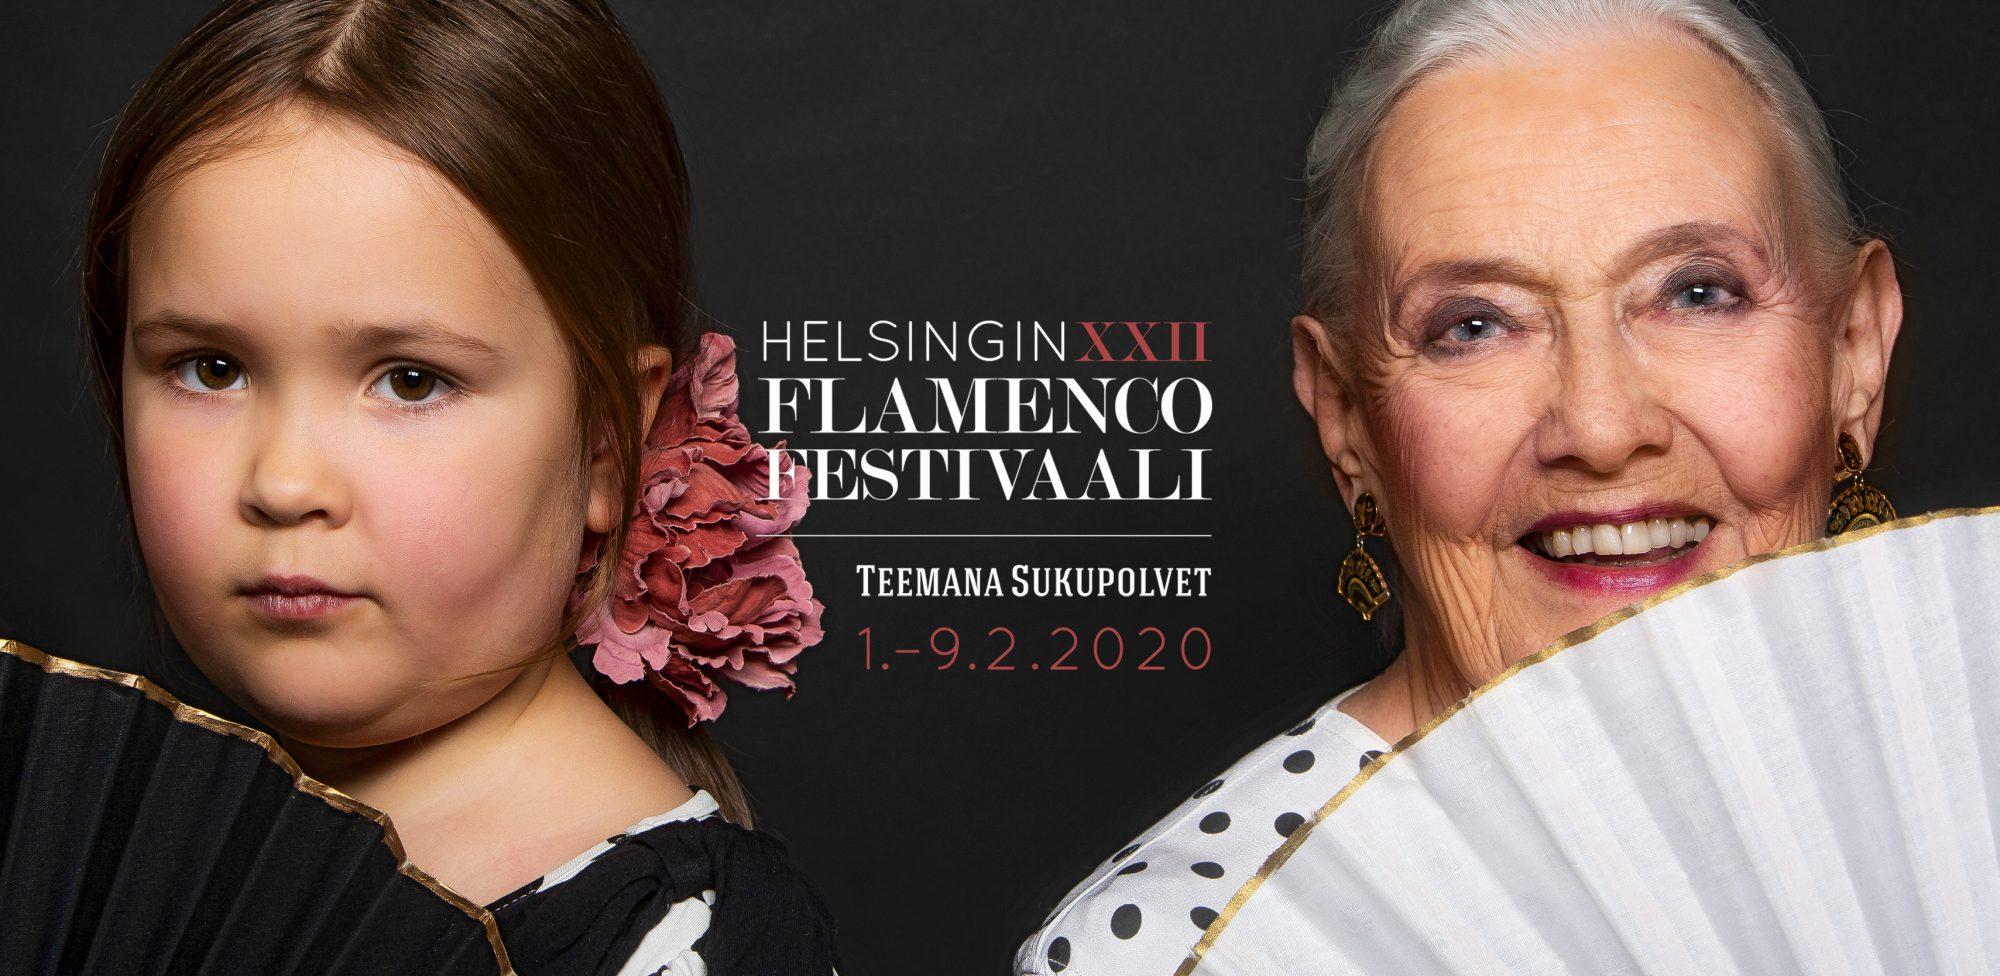 8 Febrero 2020 | Helsinki Flamenco Festival 1